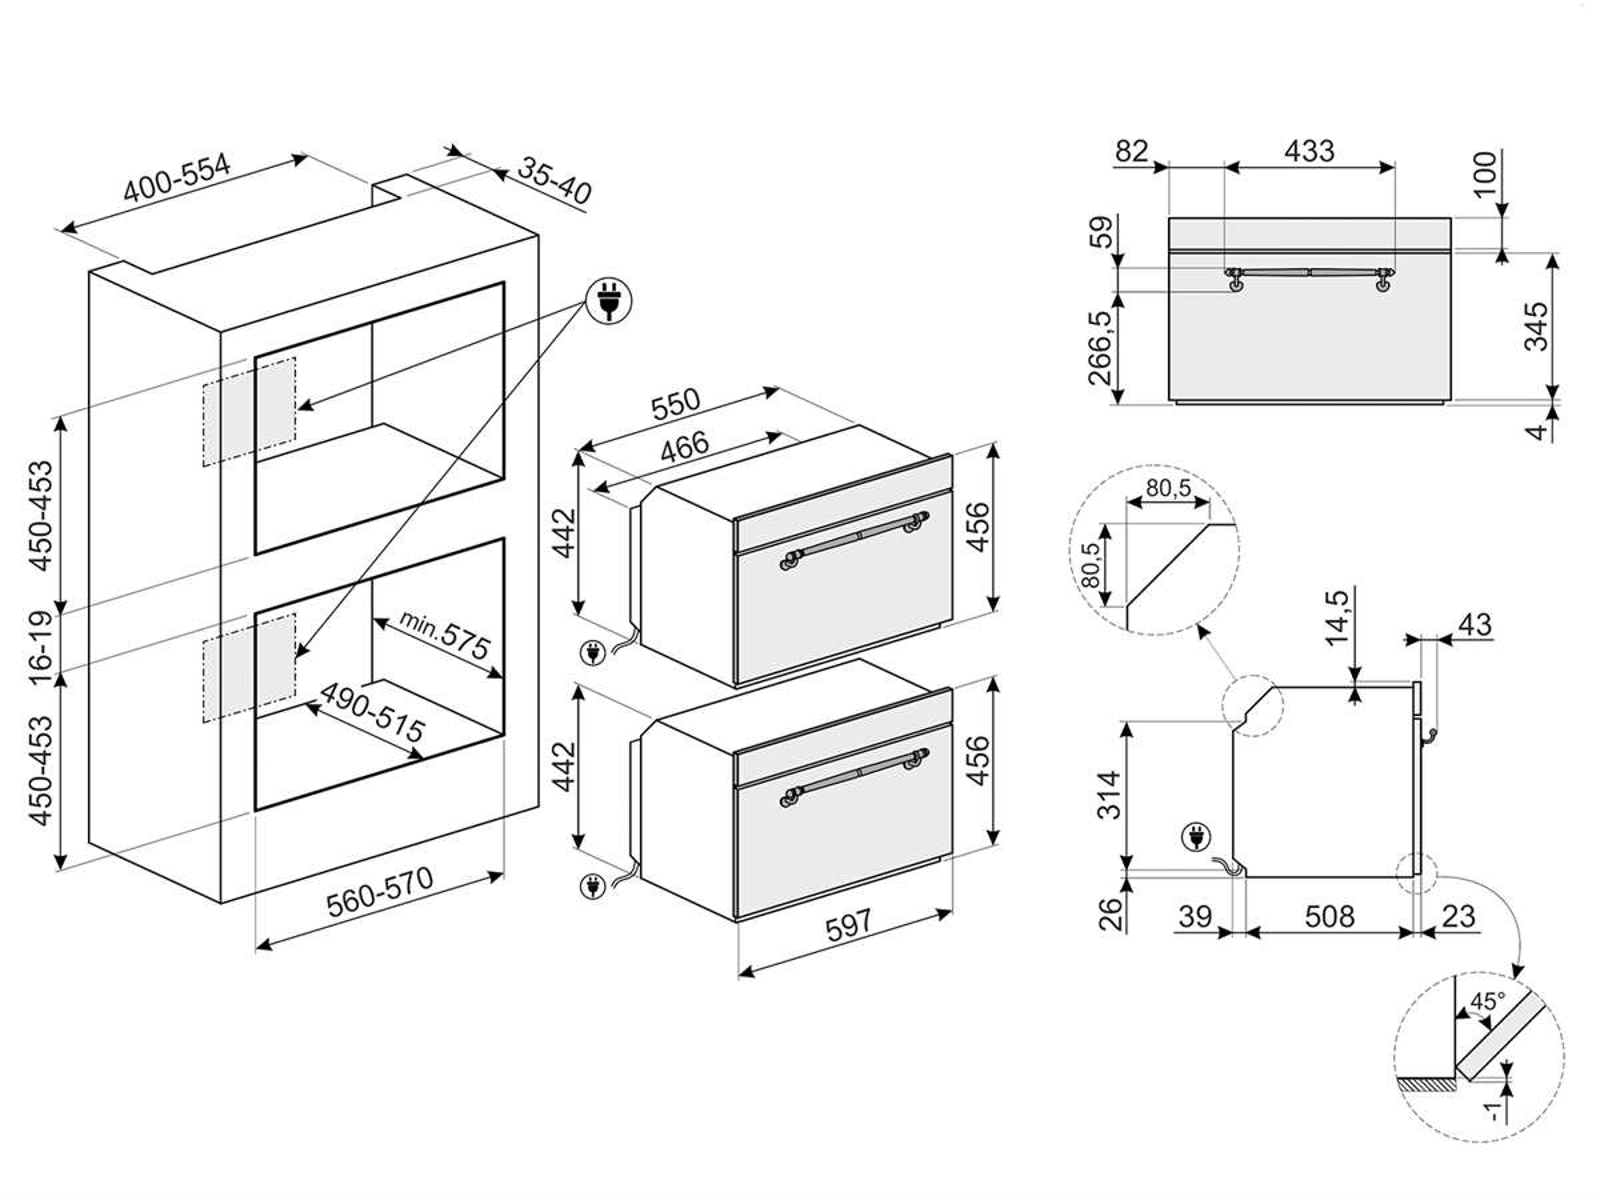 Smeg SF4750MPO Kompakt Mikrowelle mit Grill Creme-Messing